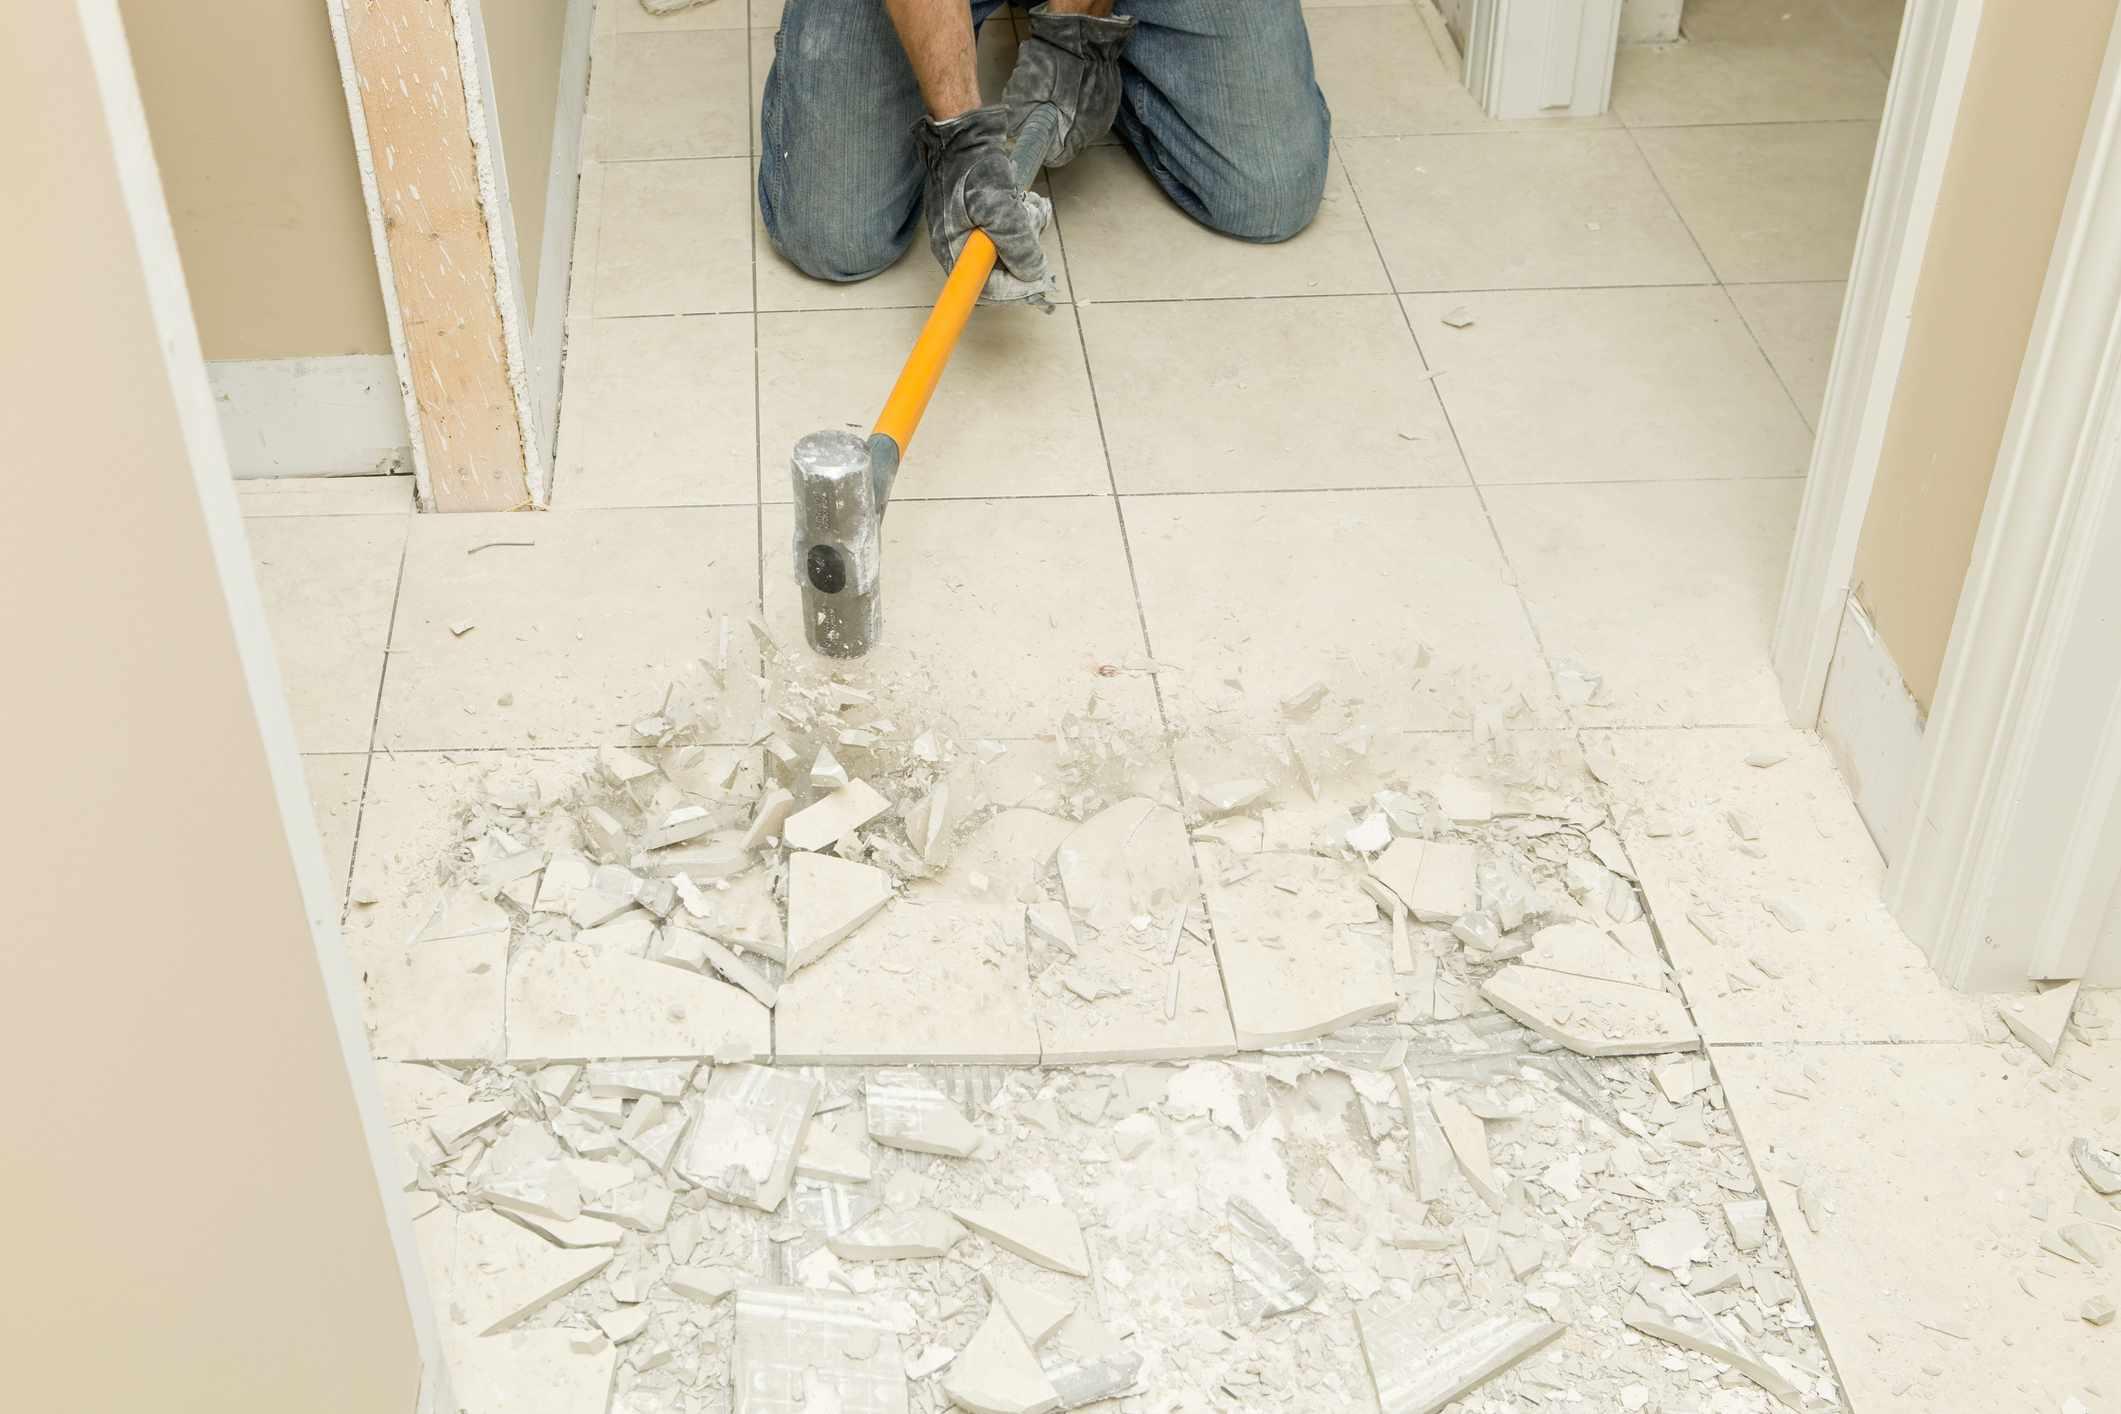 Breaking marble with sledgehammer